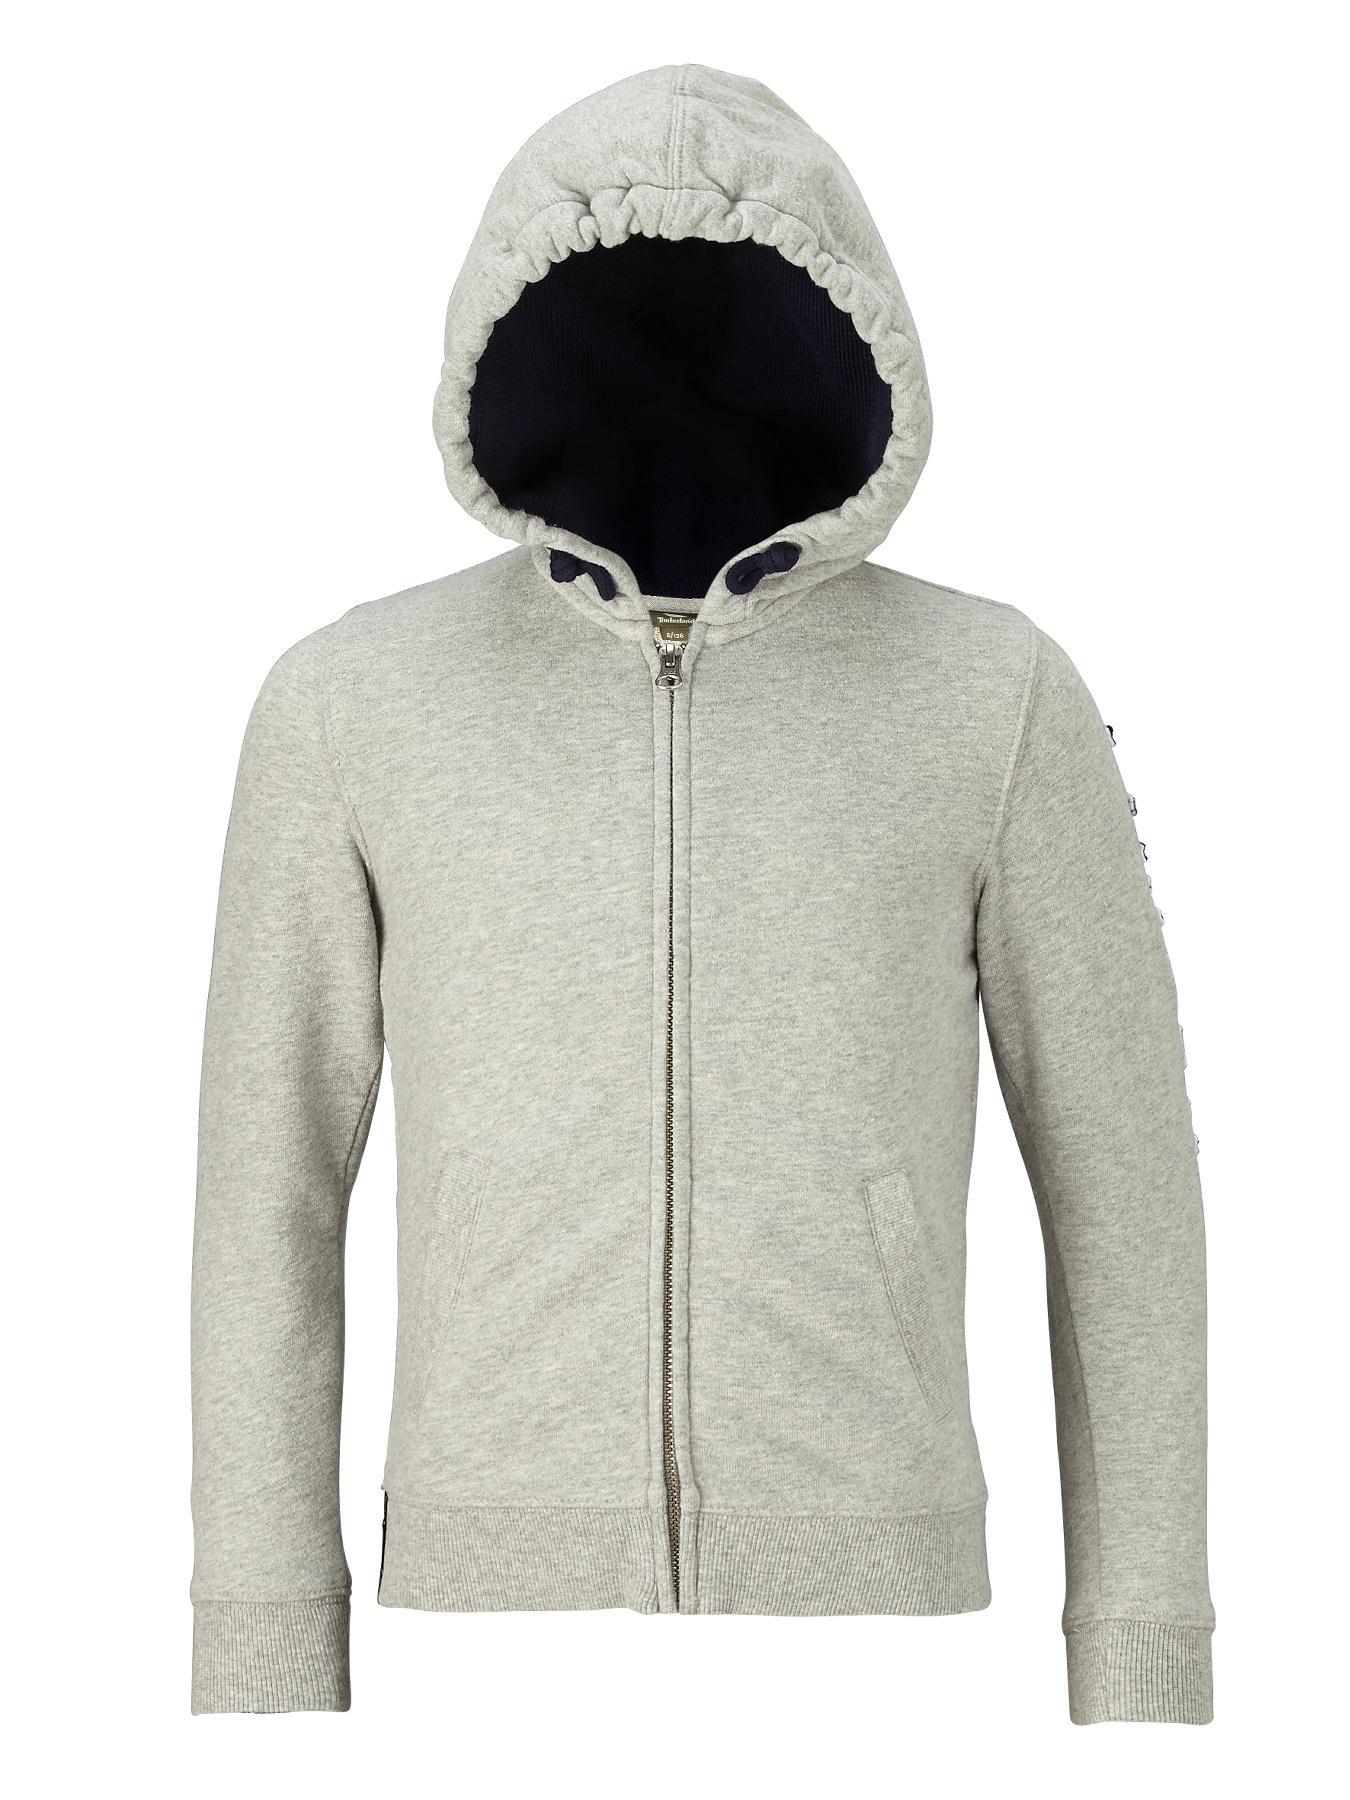 Timberland Zip Thru Hoody - Grey, Grey